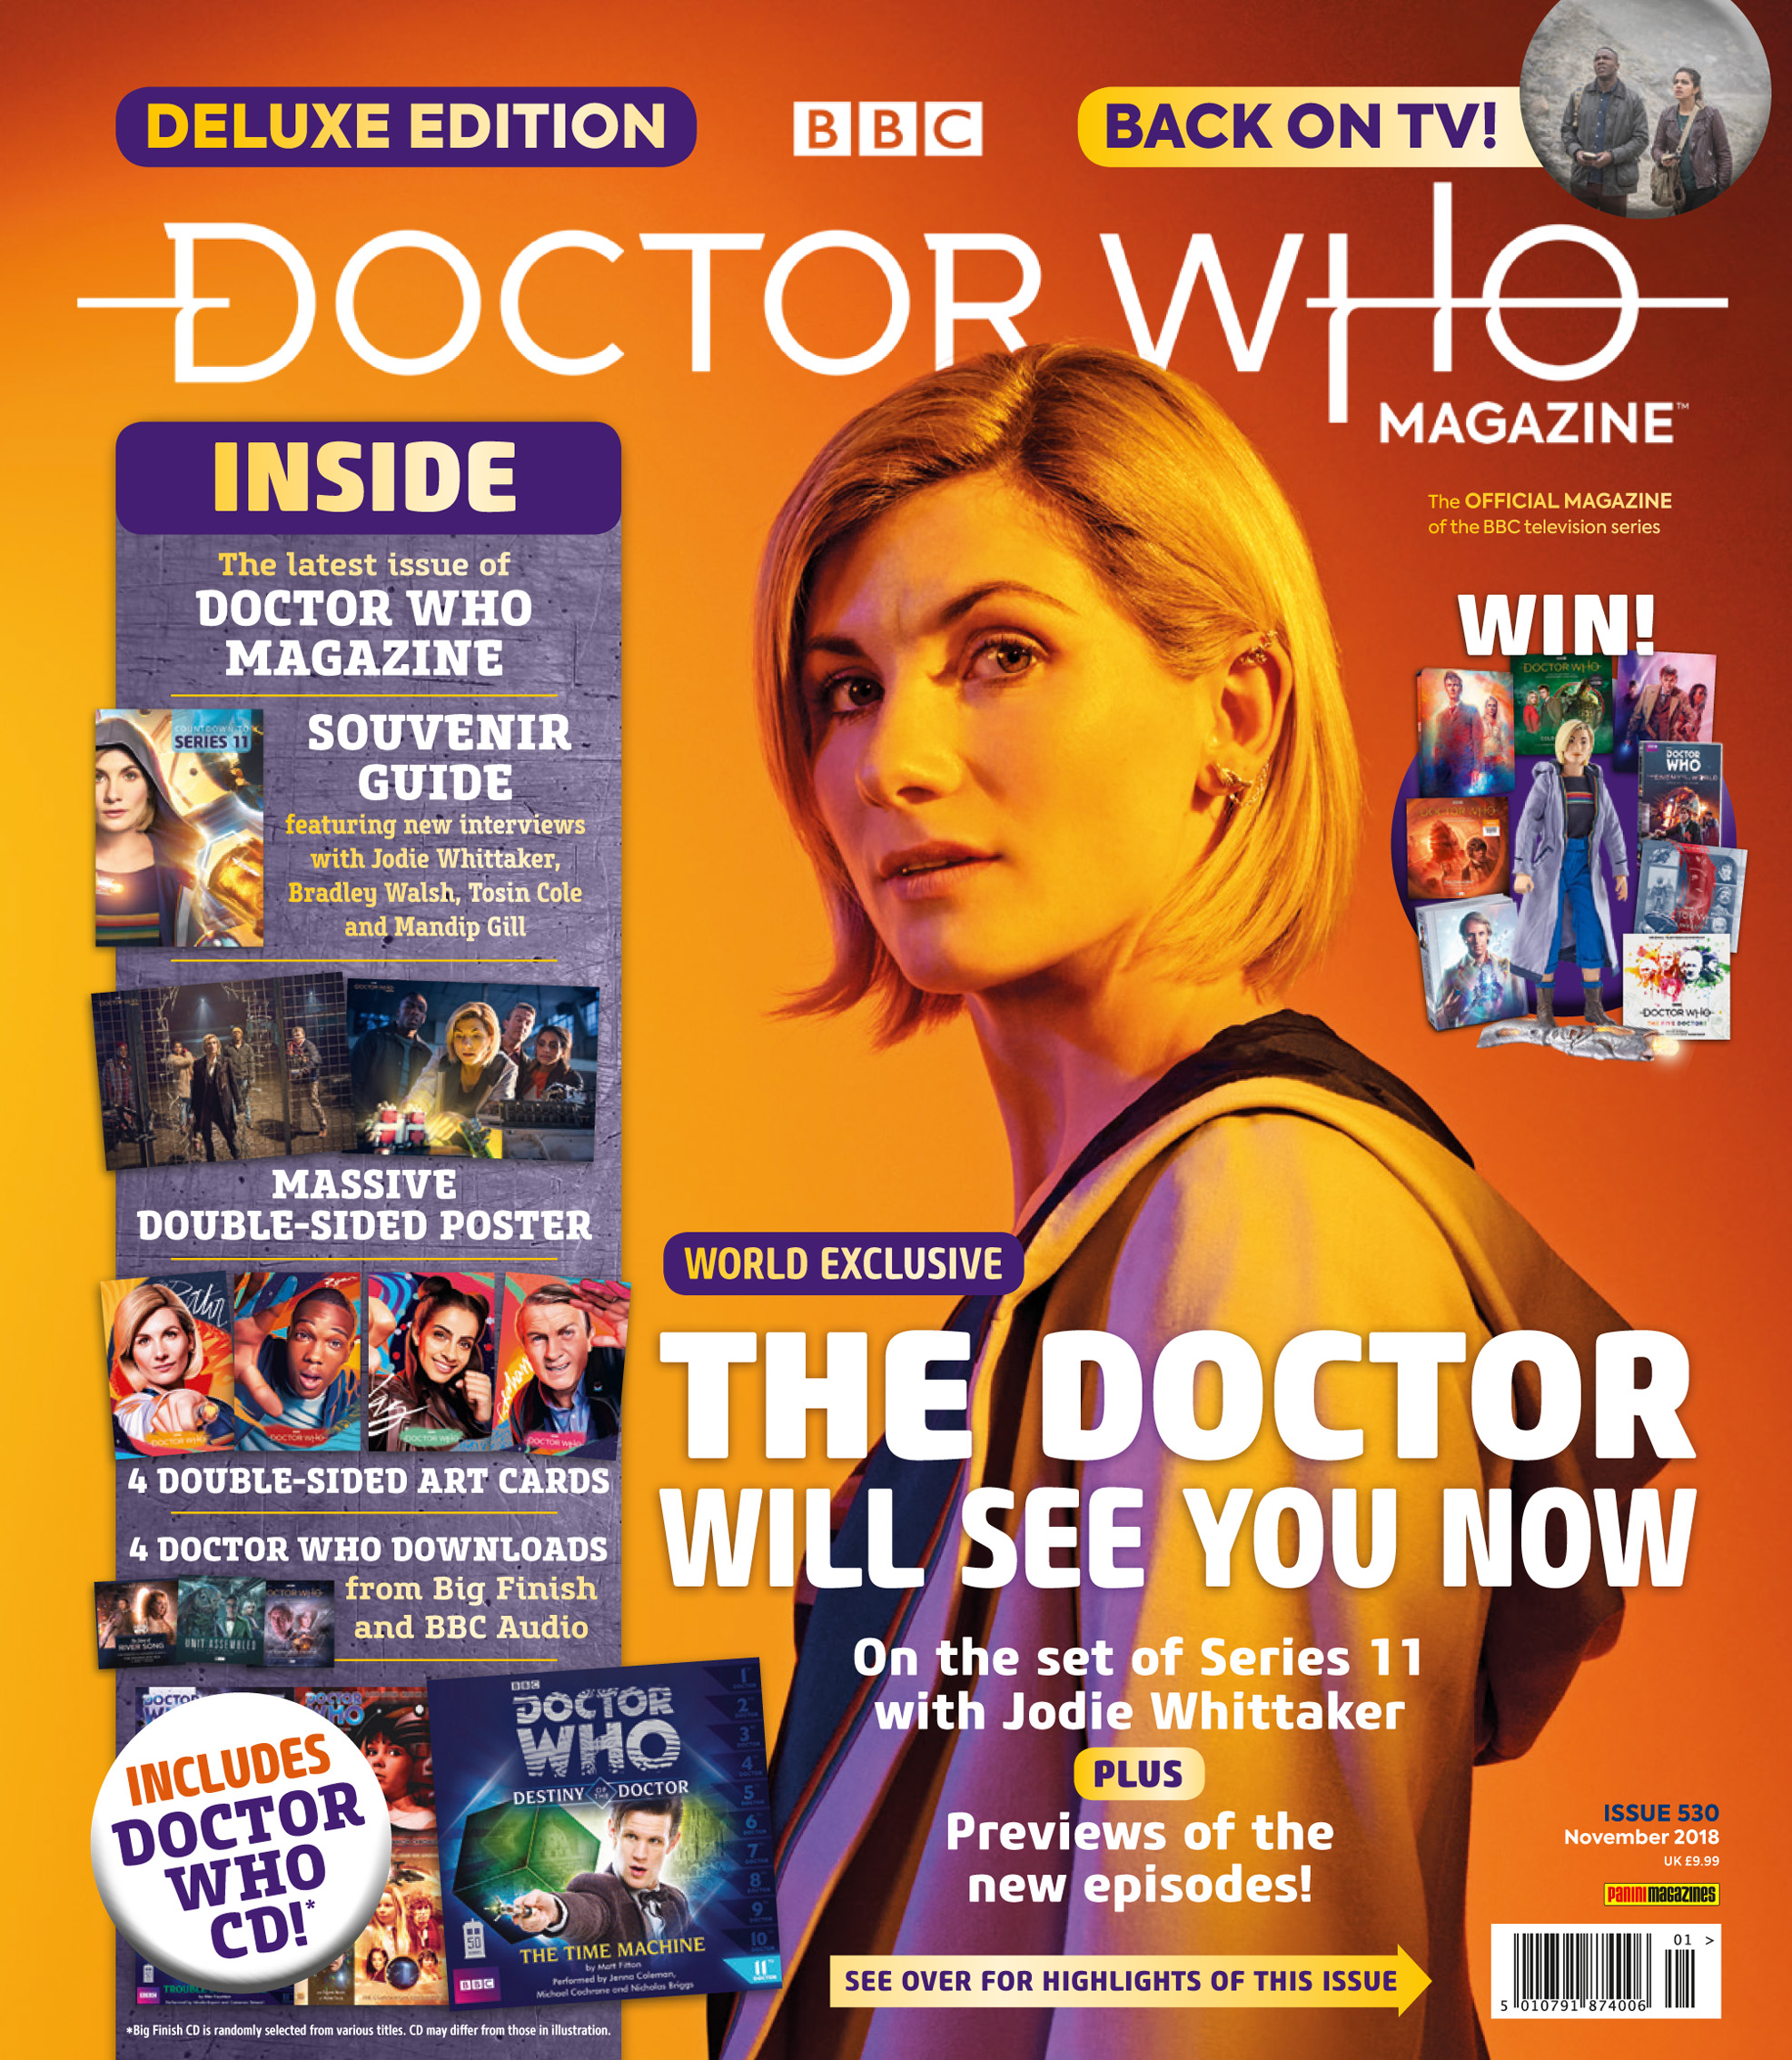 DOCTOR WHO MAGAZINE 530 – Doctor Who Magazine